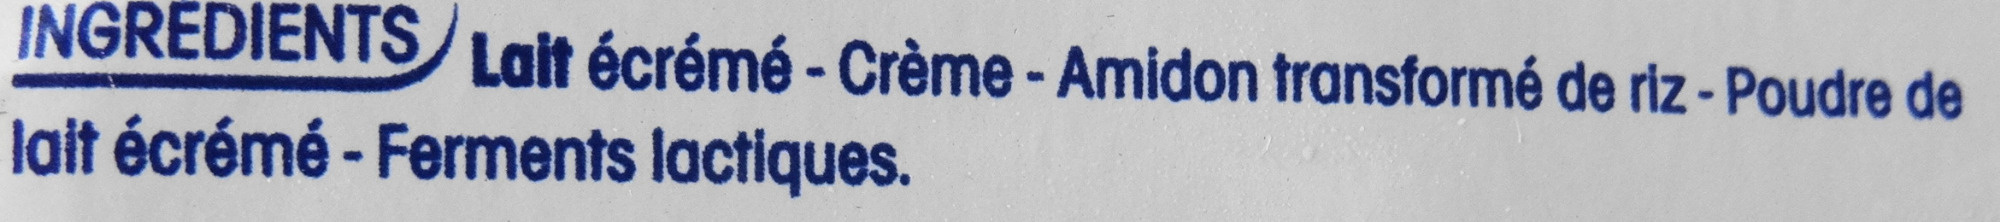 Perle de Lait Nature - Ingrediënten - fr